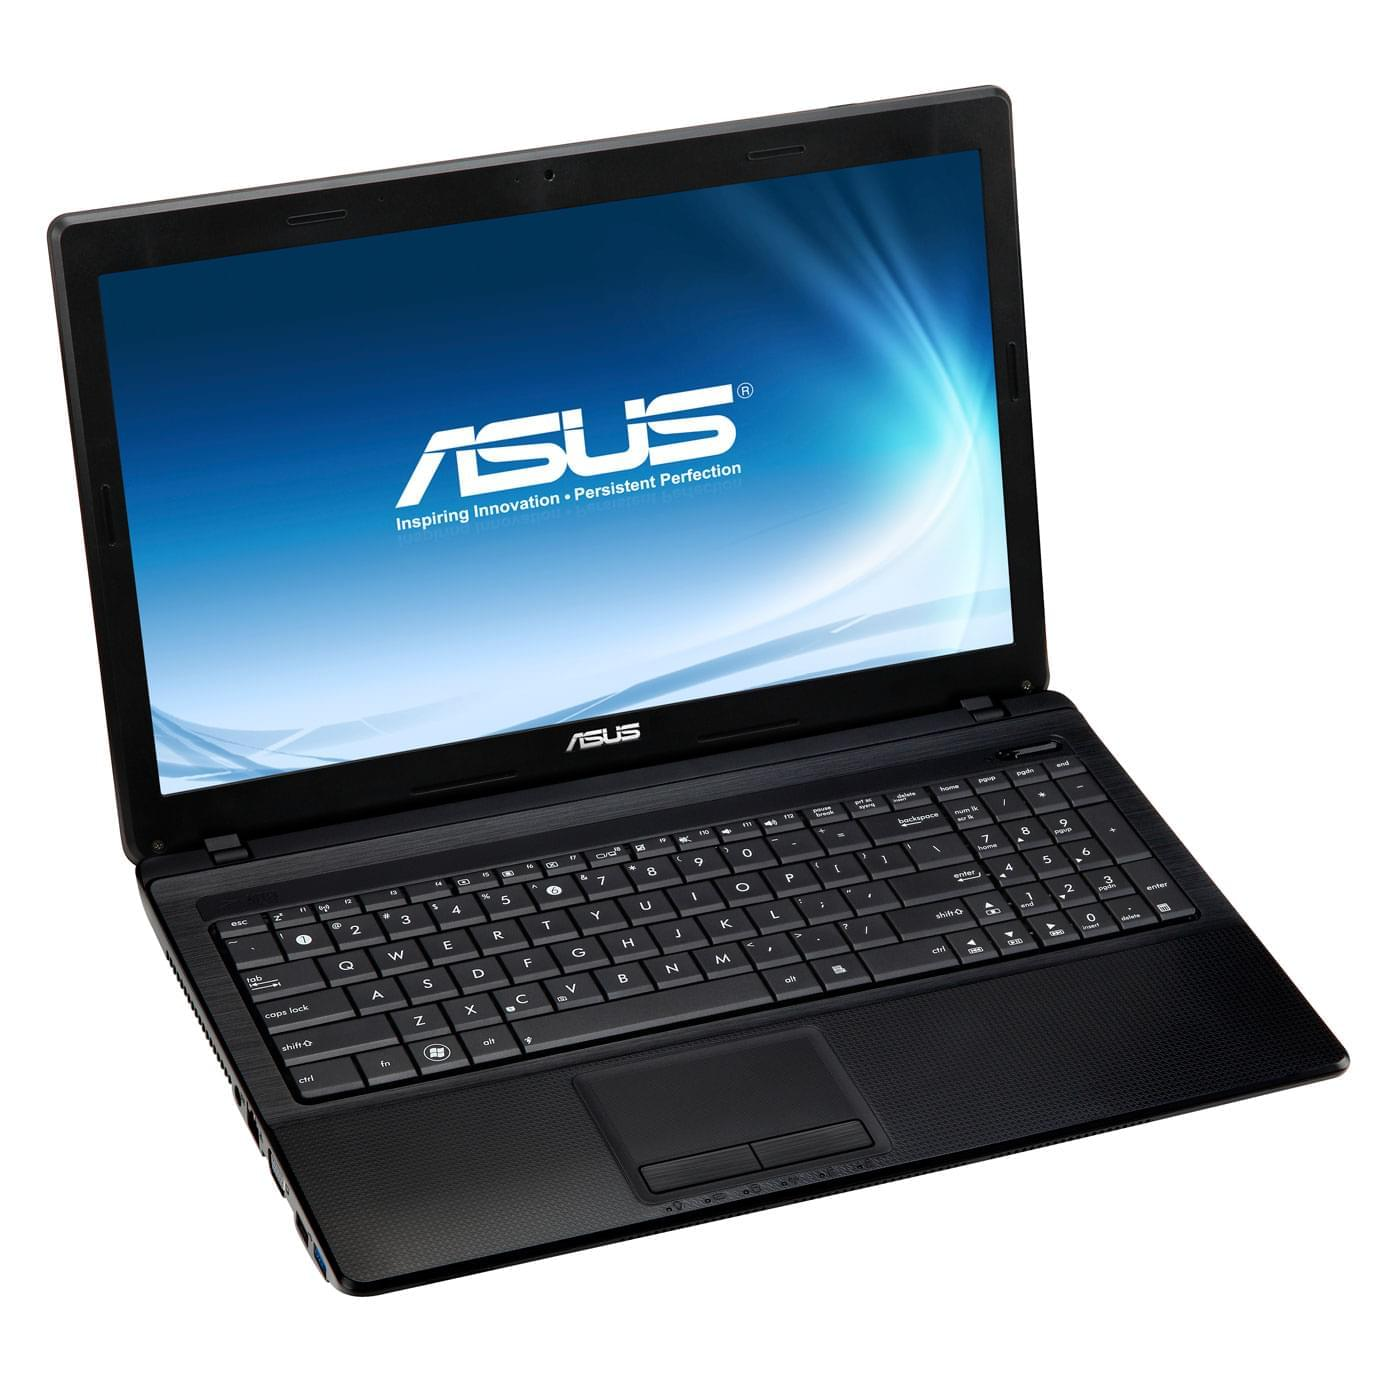 Asus X54C-SX034V - PC portable Asus - Cybertek.fr - 0